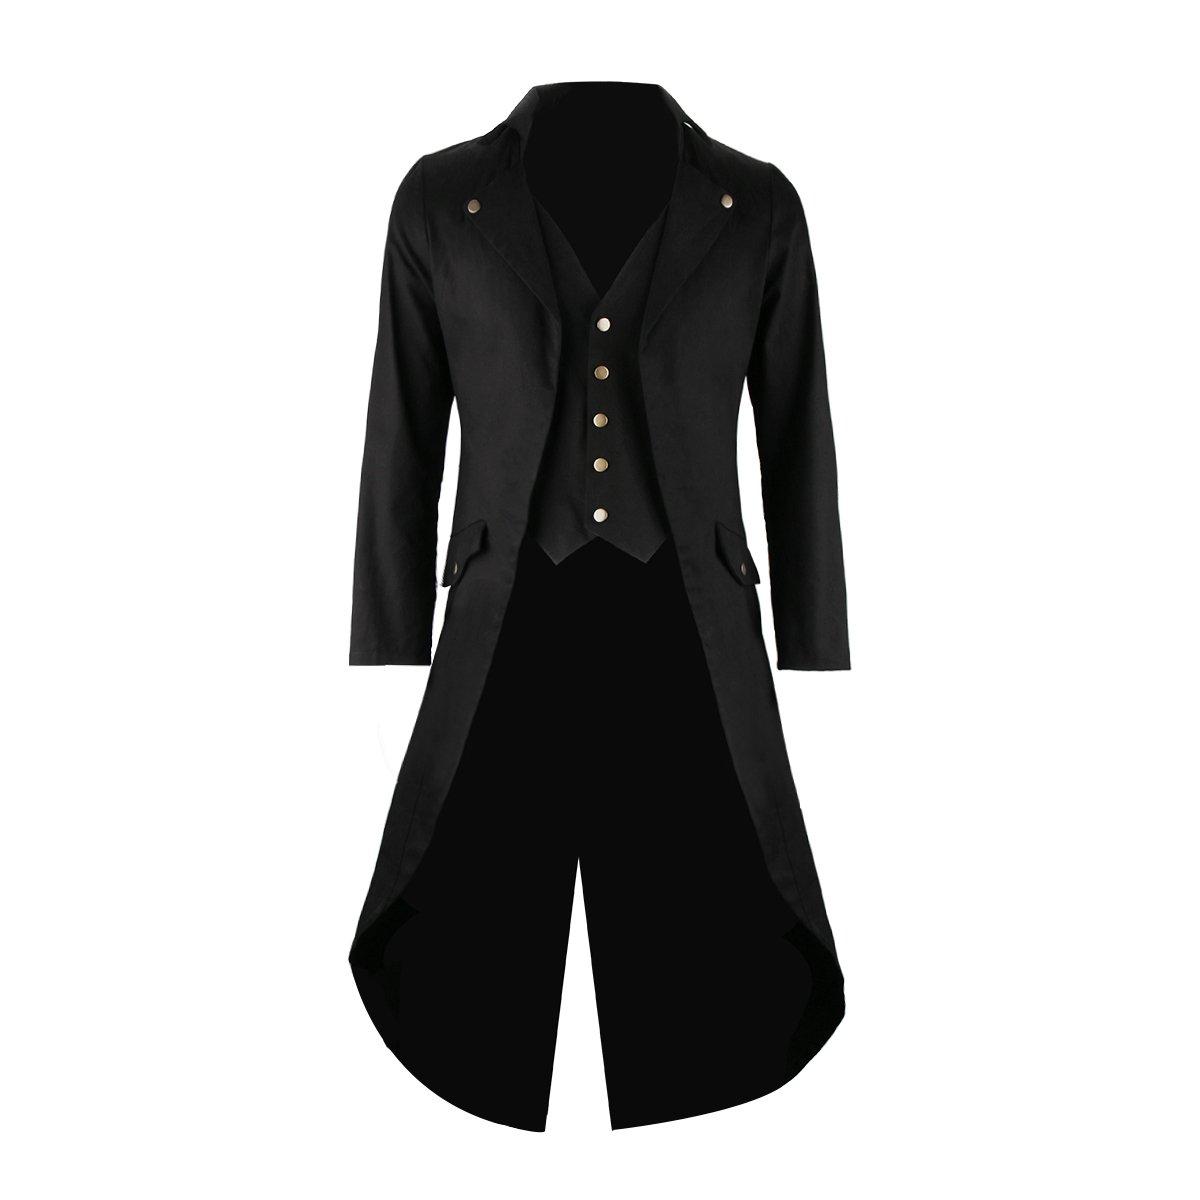 1c319cad5ae8 Amazon.com: Mens Black Tailcoat Jacket Gothic Steampunk Victorian VTG  Halloween Costume Long Coat: Clothing